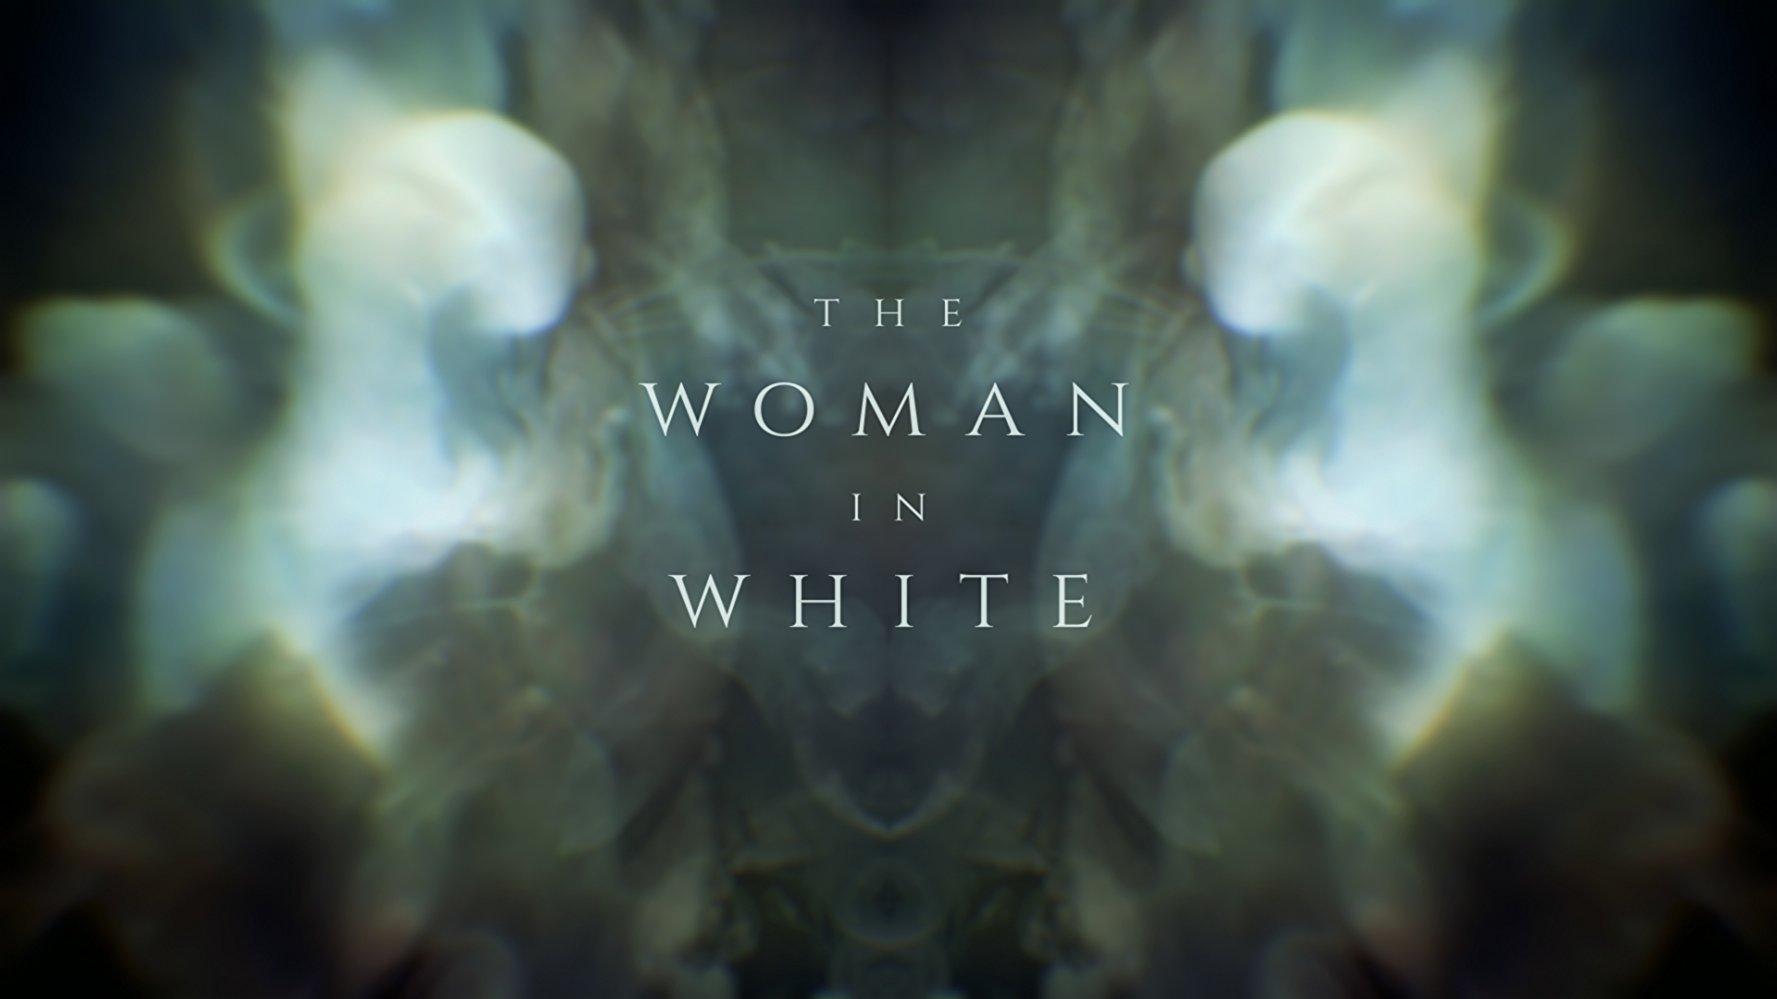 The Woman In White S01E04 HDTV x264-MTB